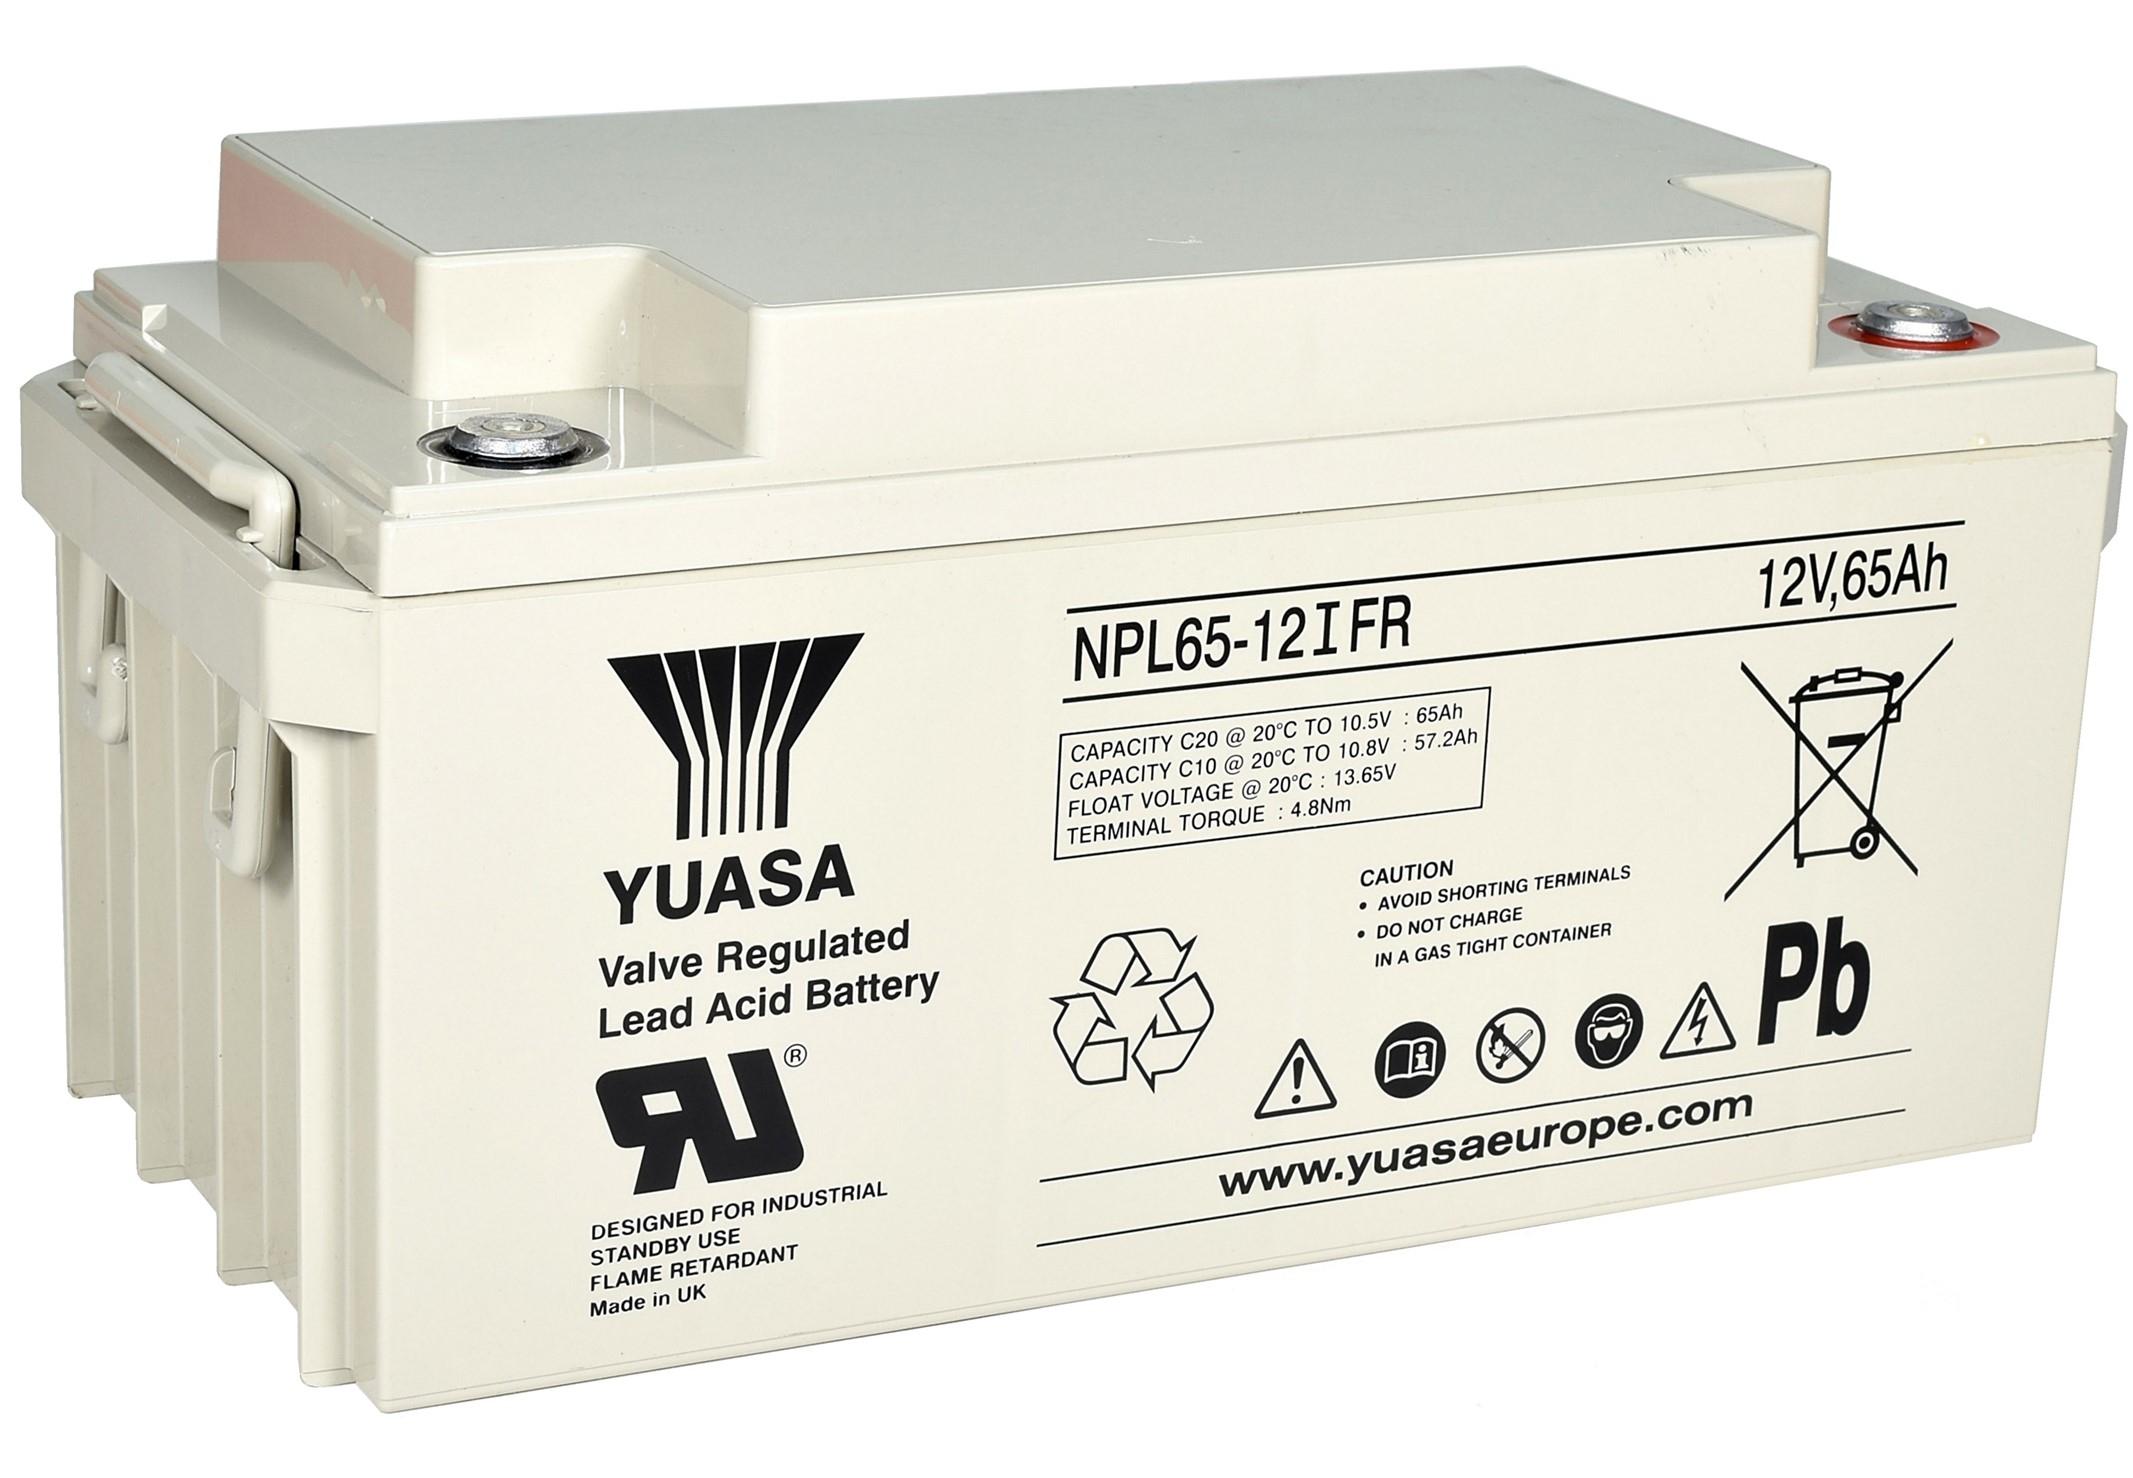 12V/65Ah Yuasa Blybatteri NPL65-12I